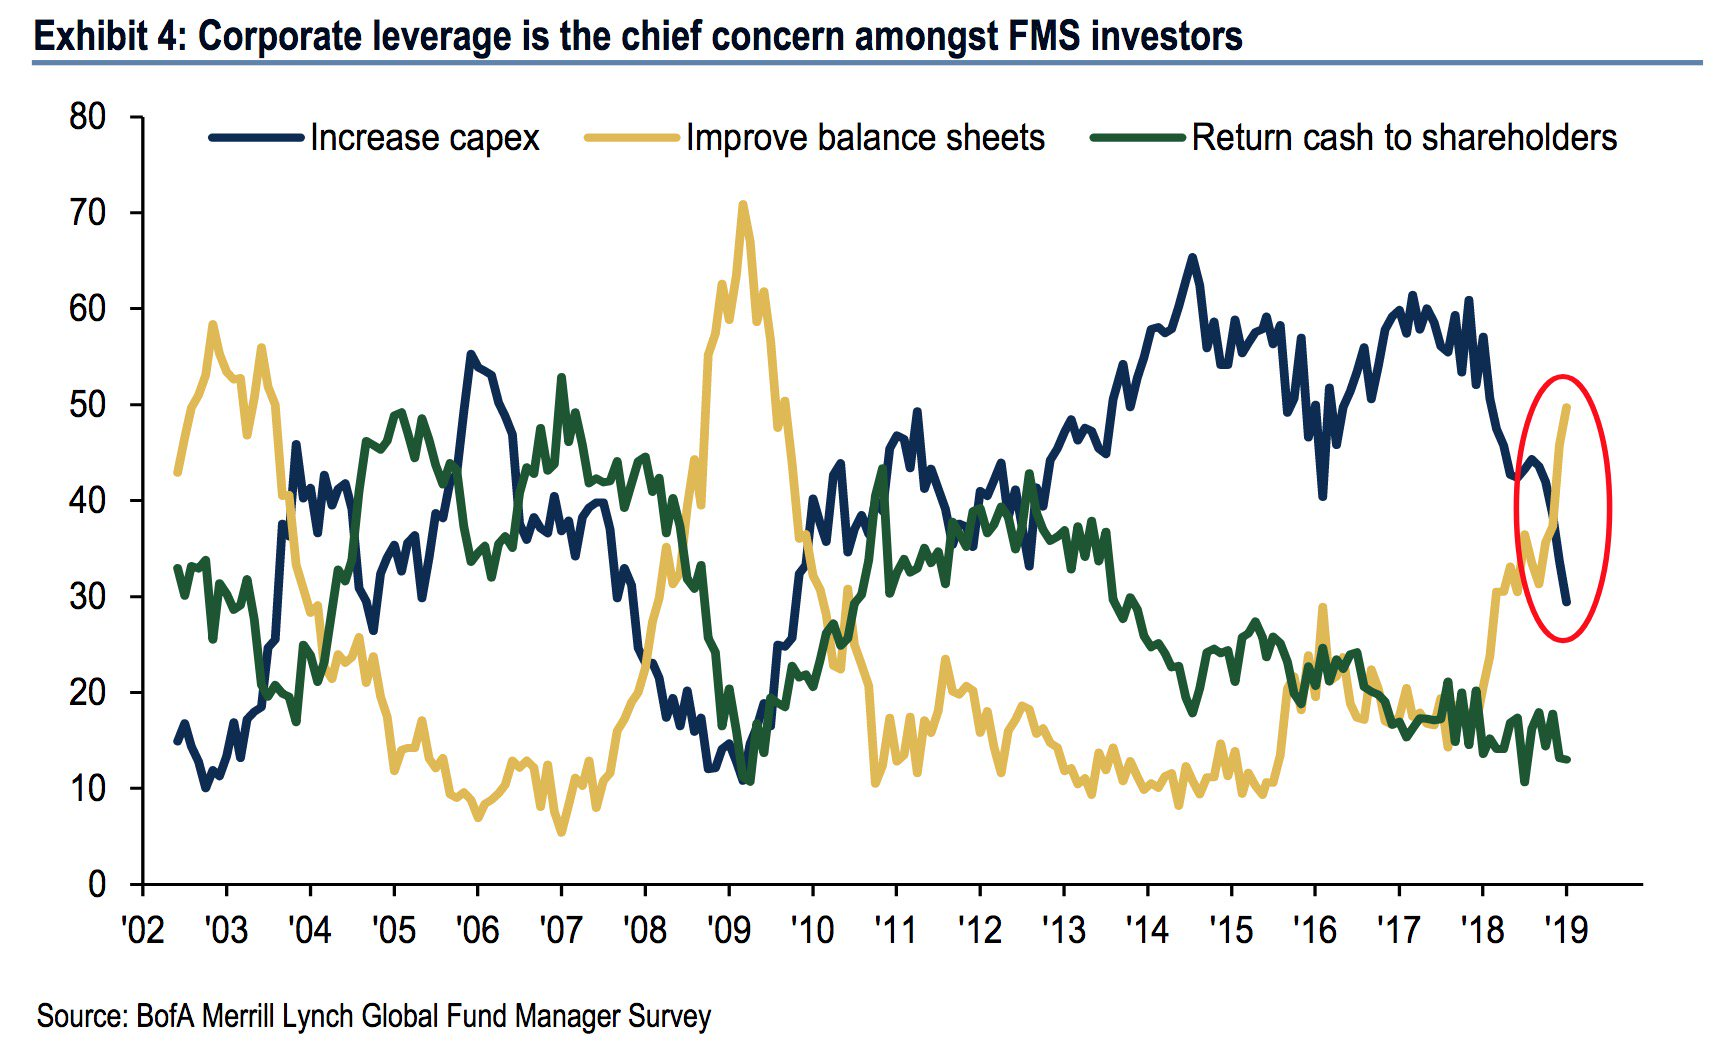 Corporate Leverage Fear January 2019